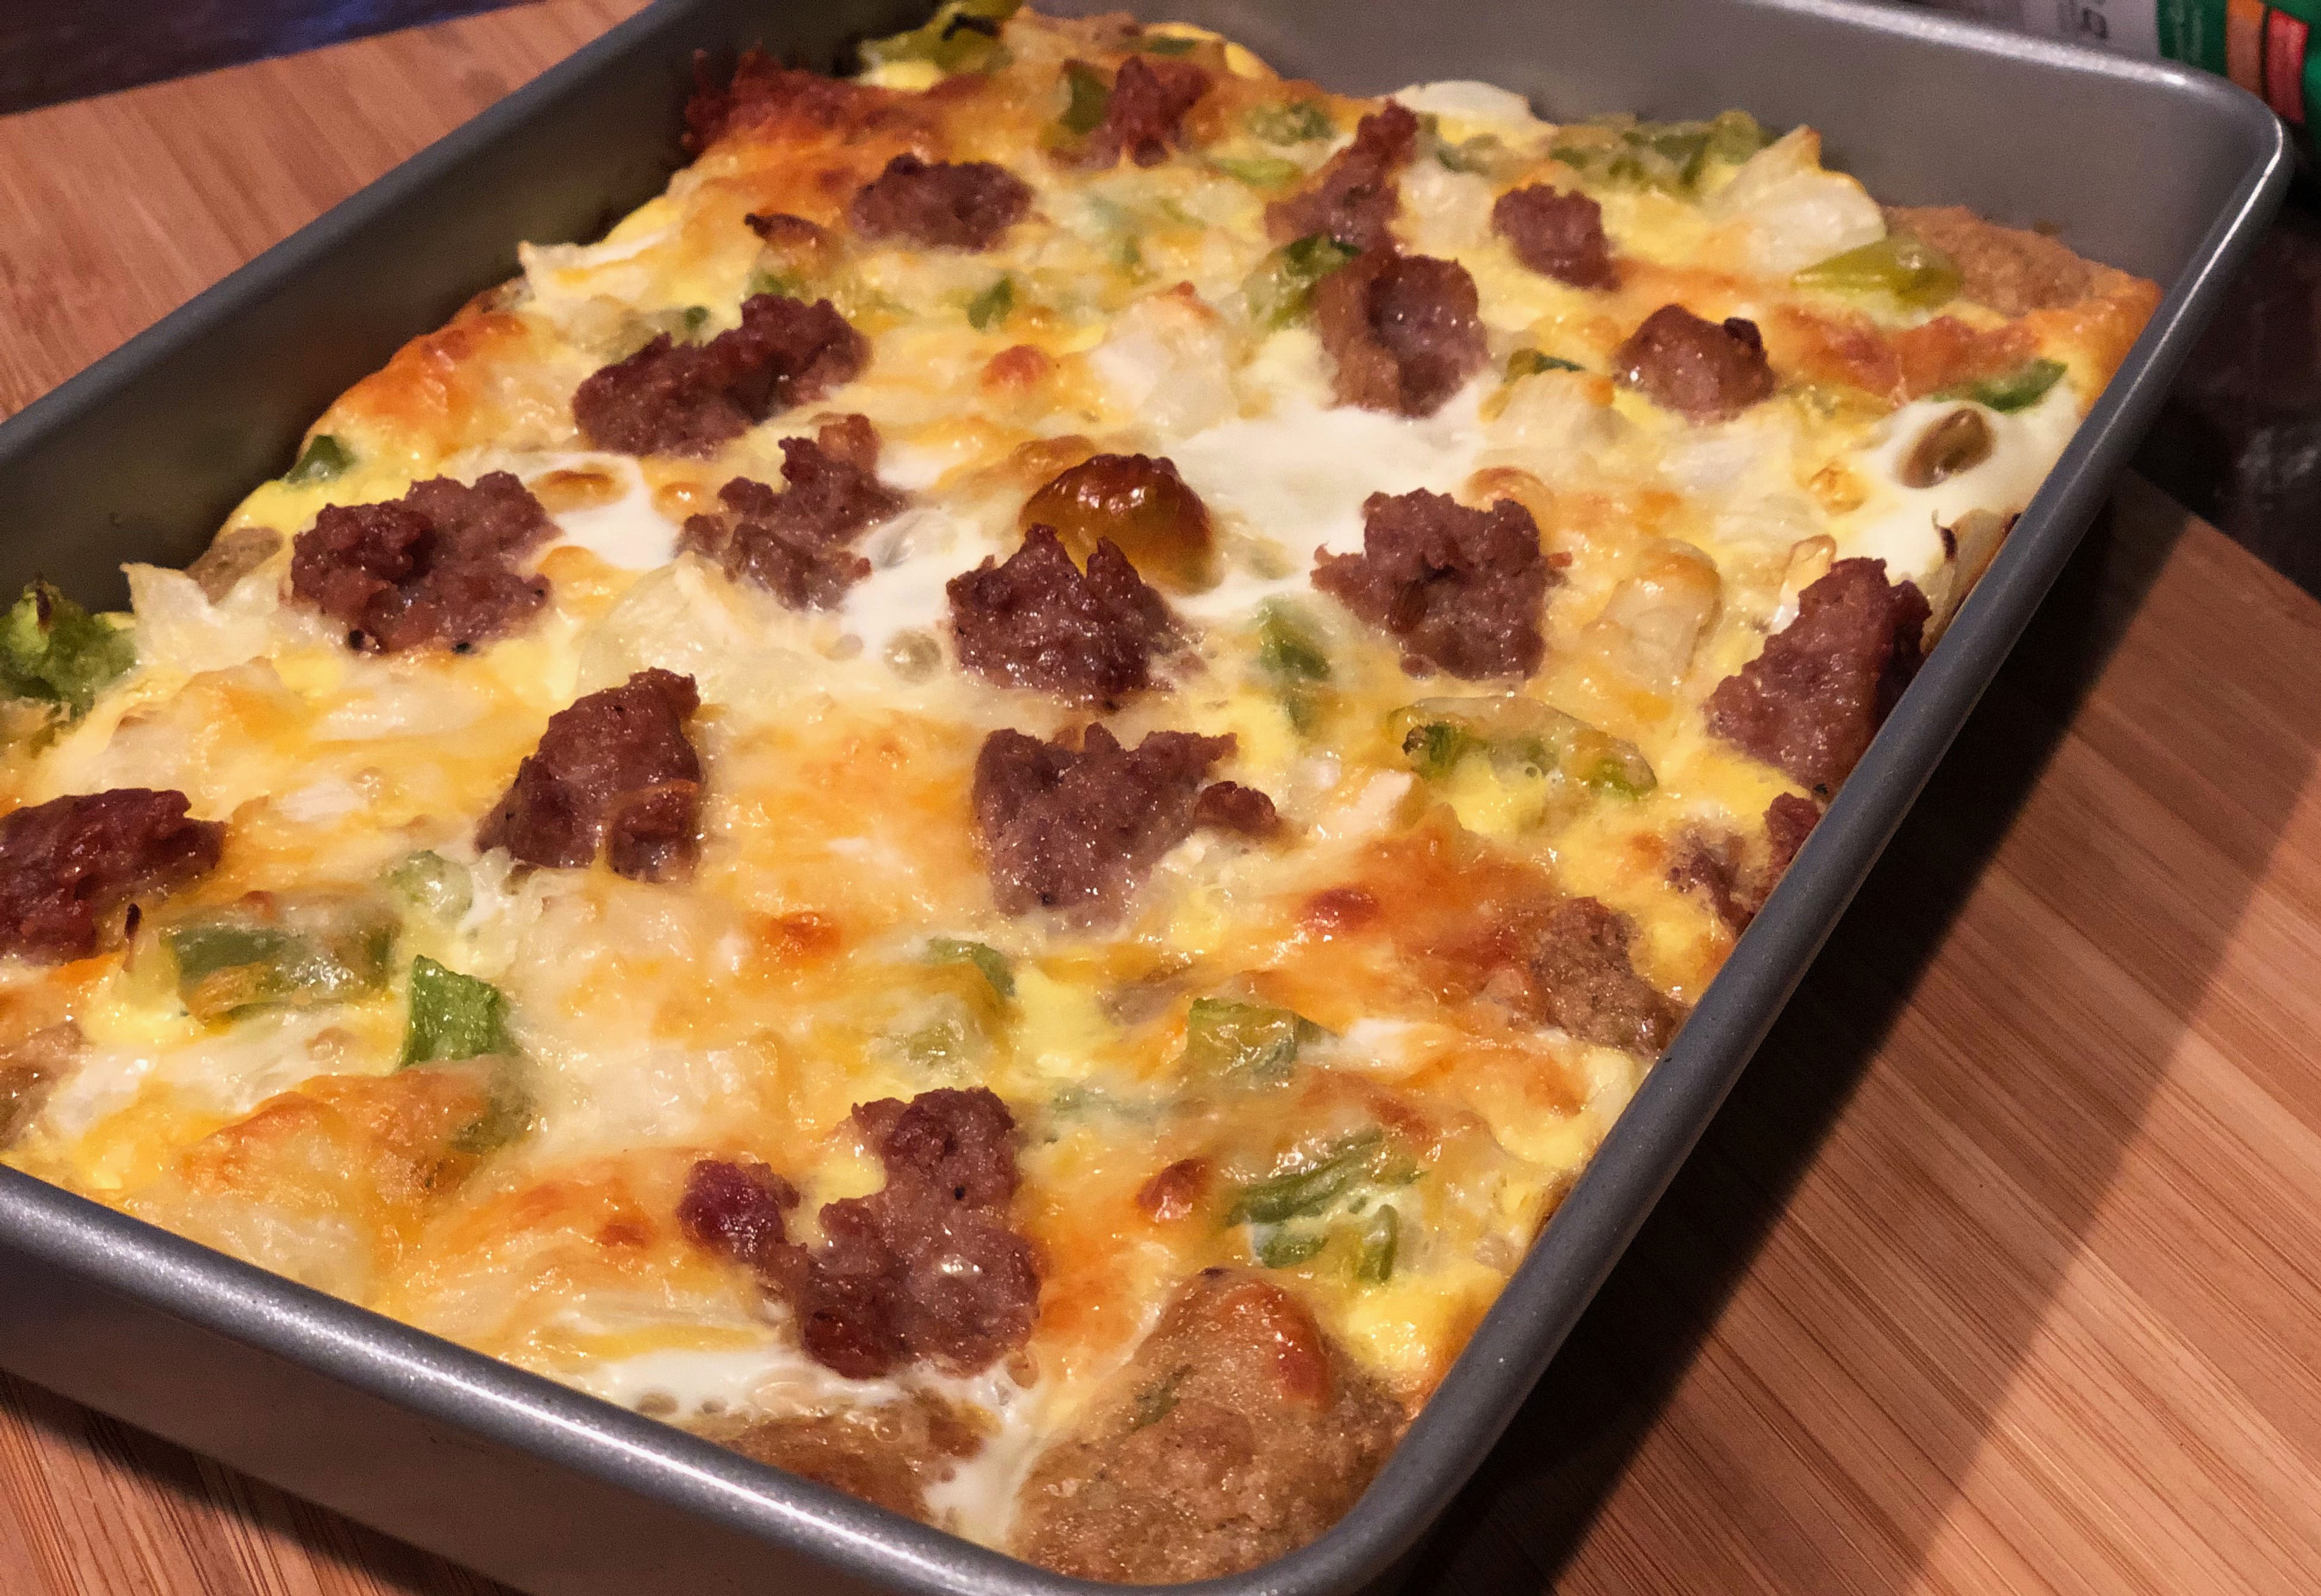 Cheesy Broccoli Veggie Tots Casserole with Sausage